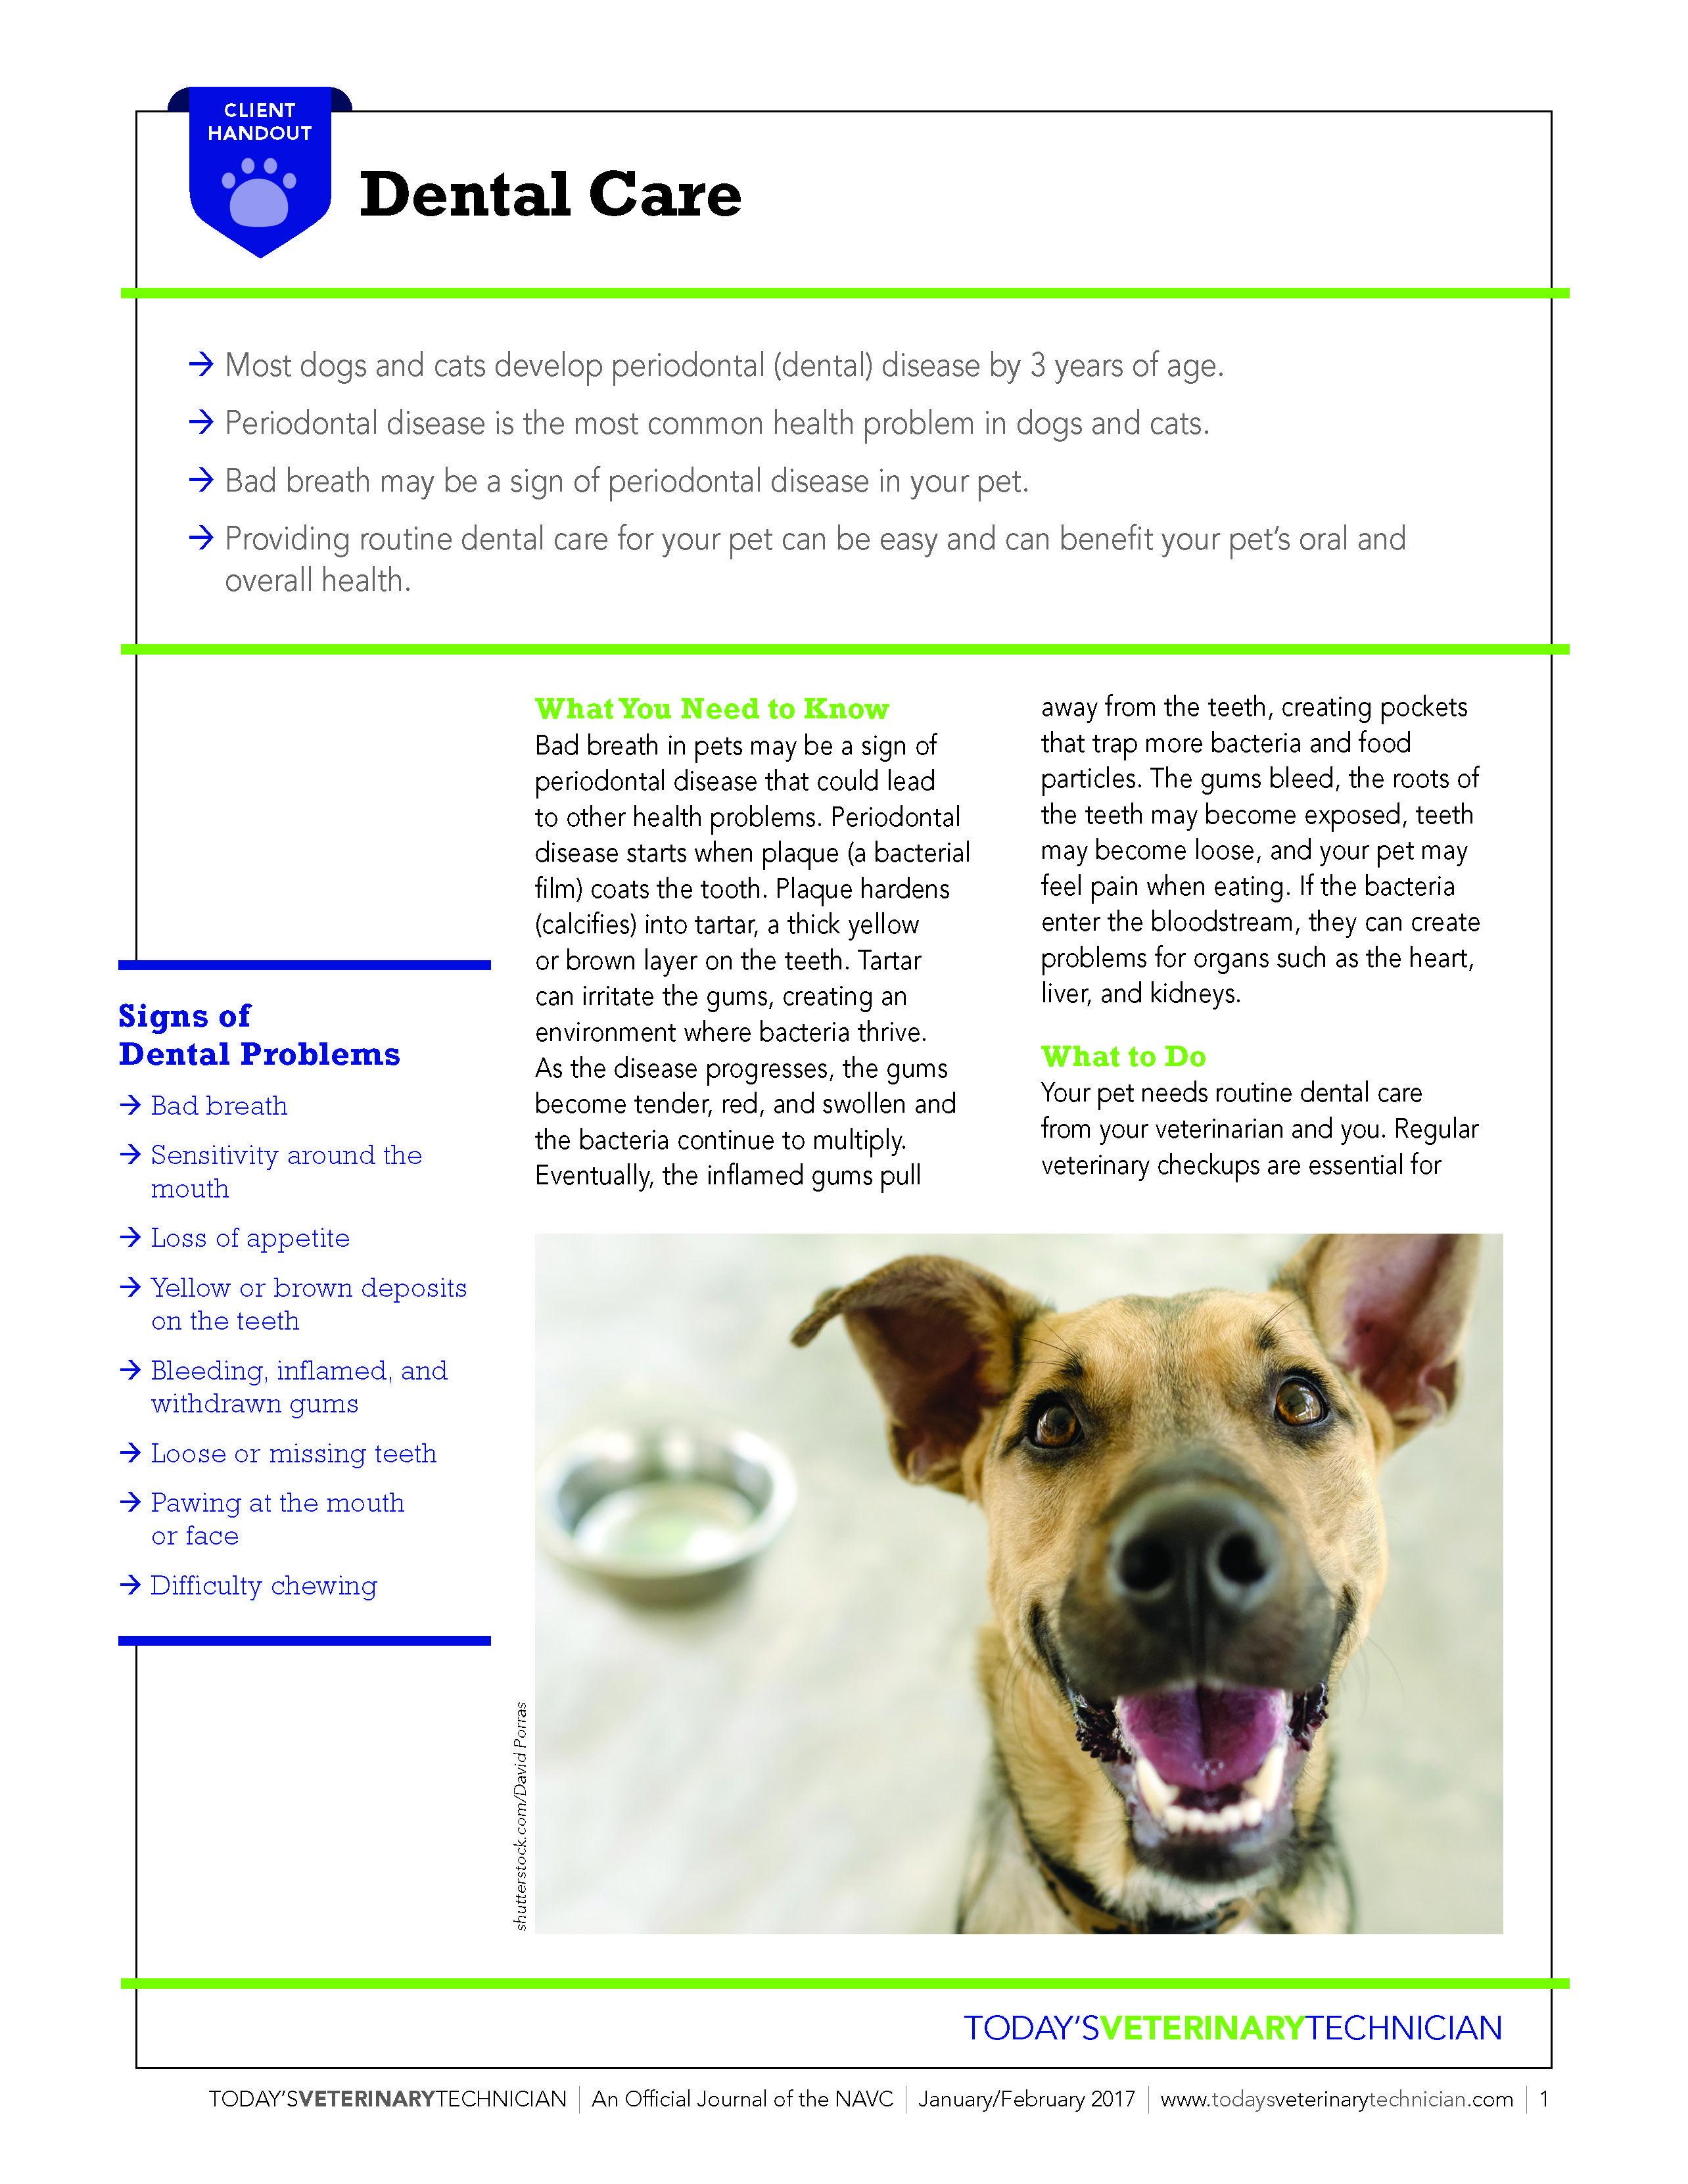 Pet Dental Care In 2020 Pet Dental Care Dental Care Dental